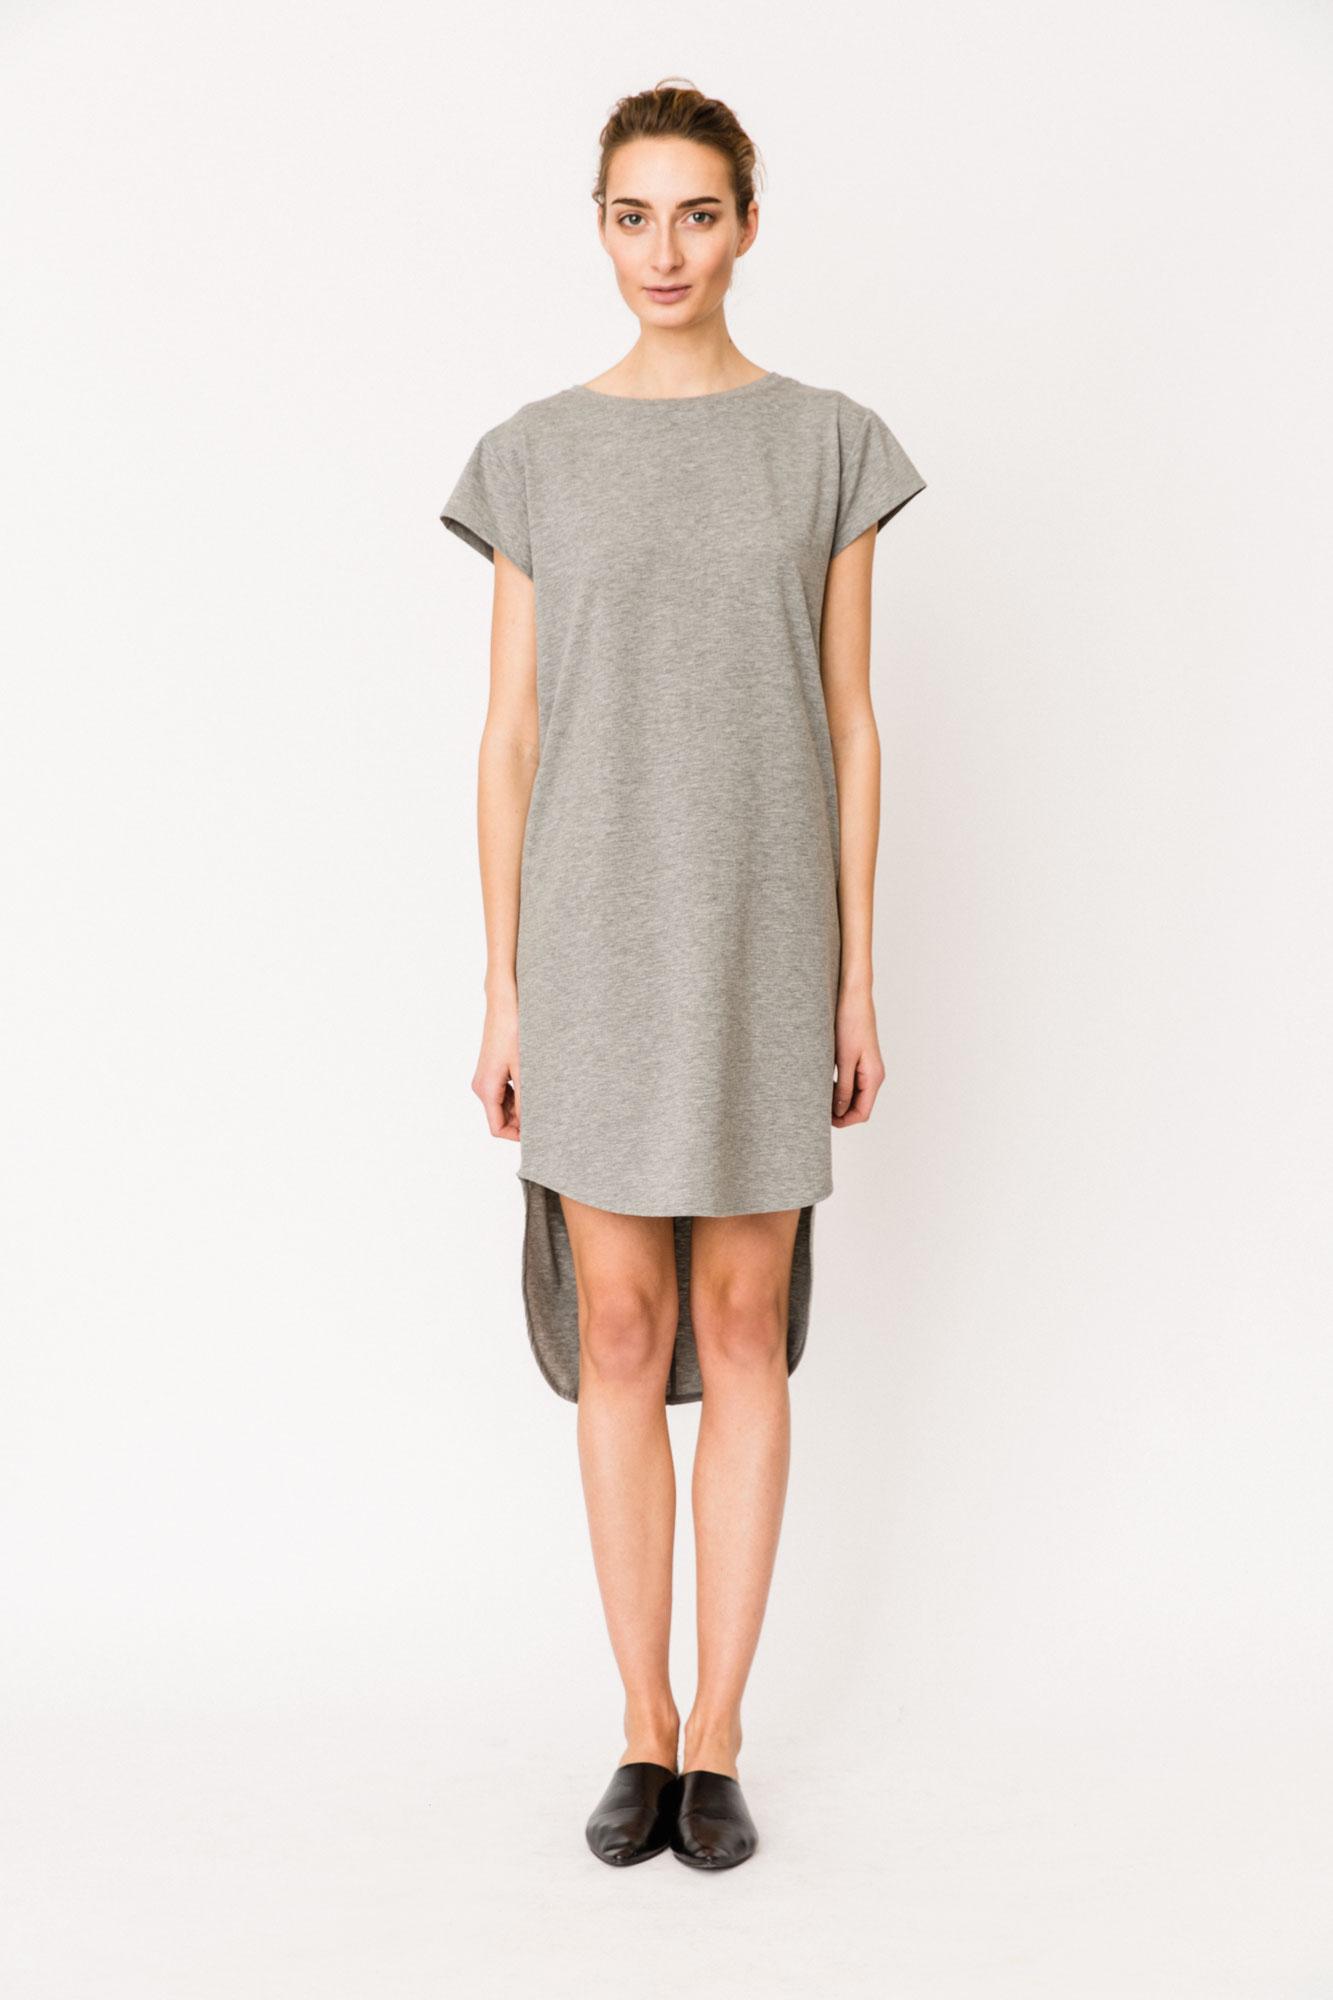 WRNS_BASICS_Inclusion-Dress_a01